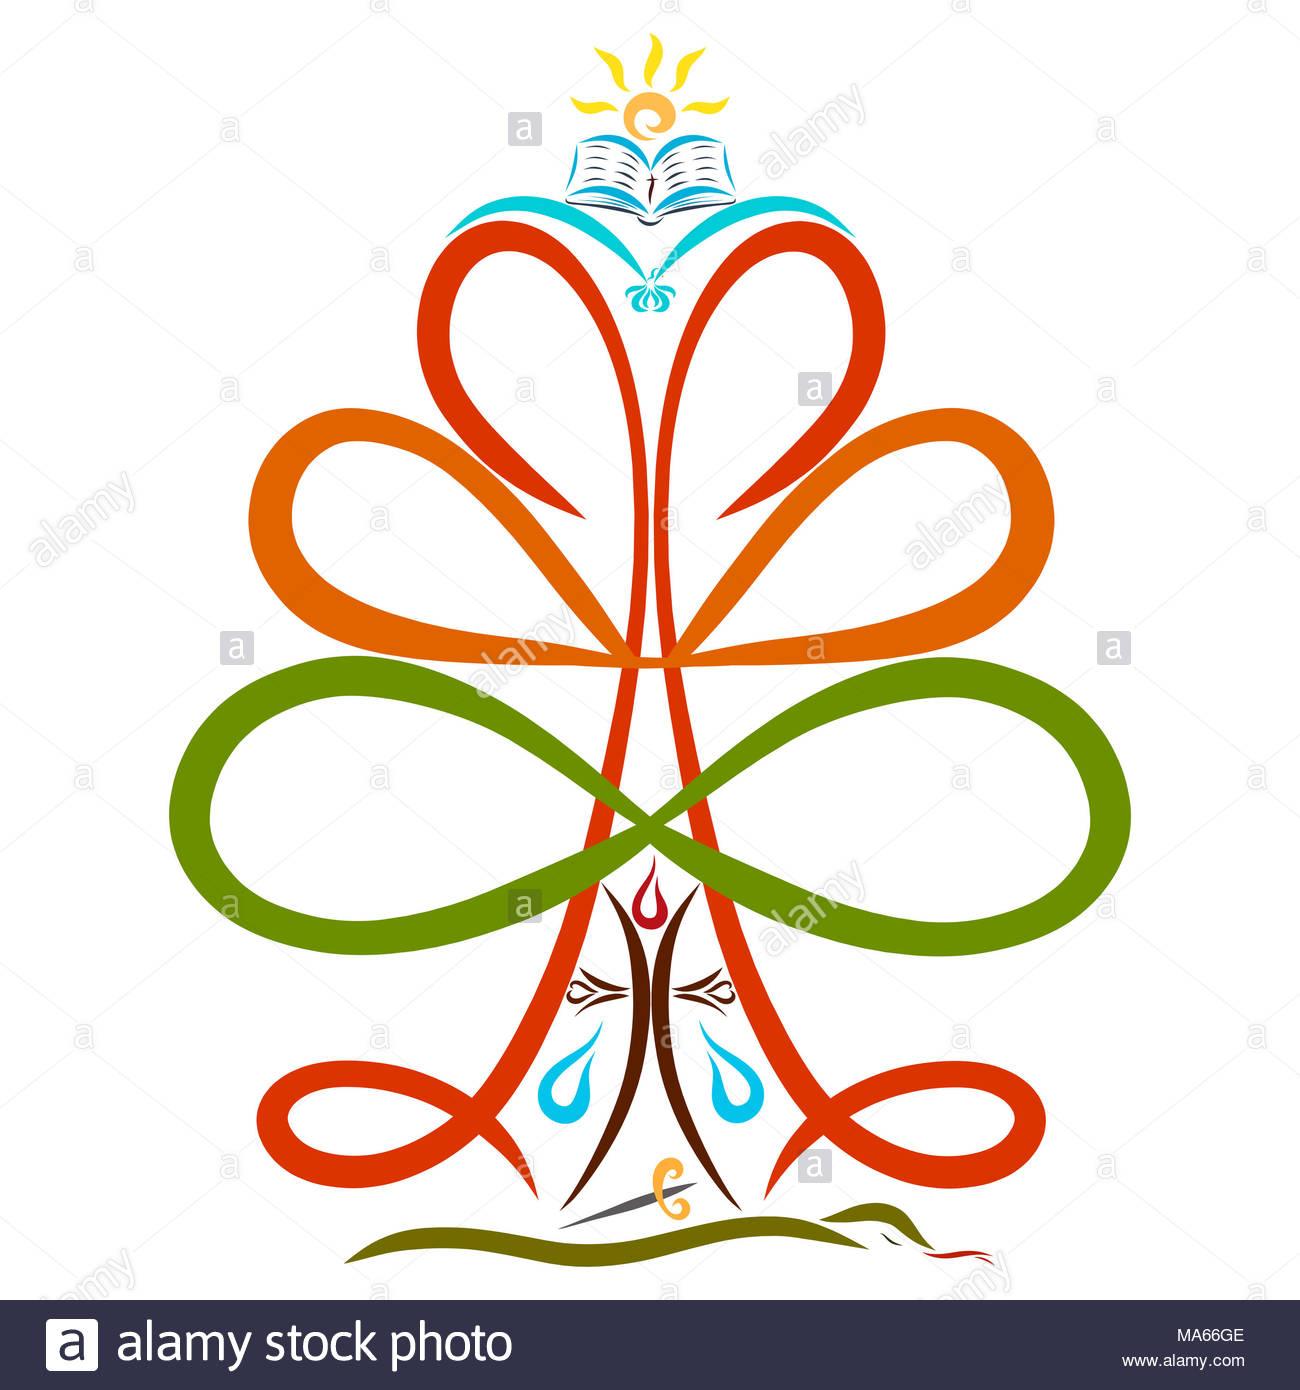 Christian Symbolism The Tree Of Life Stock Photo 178387118 Alamy